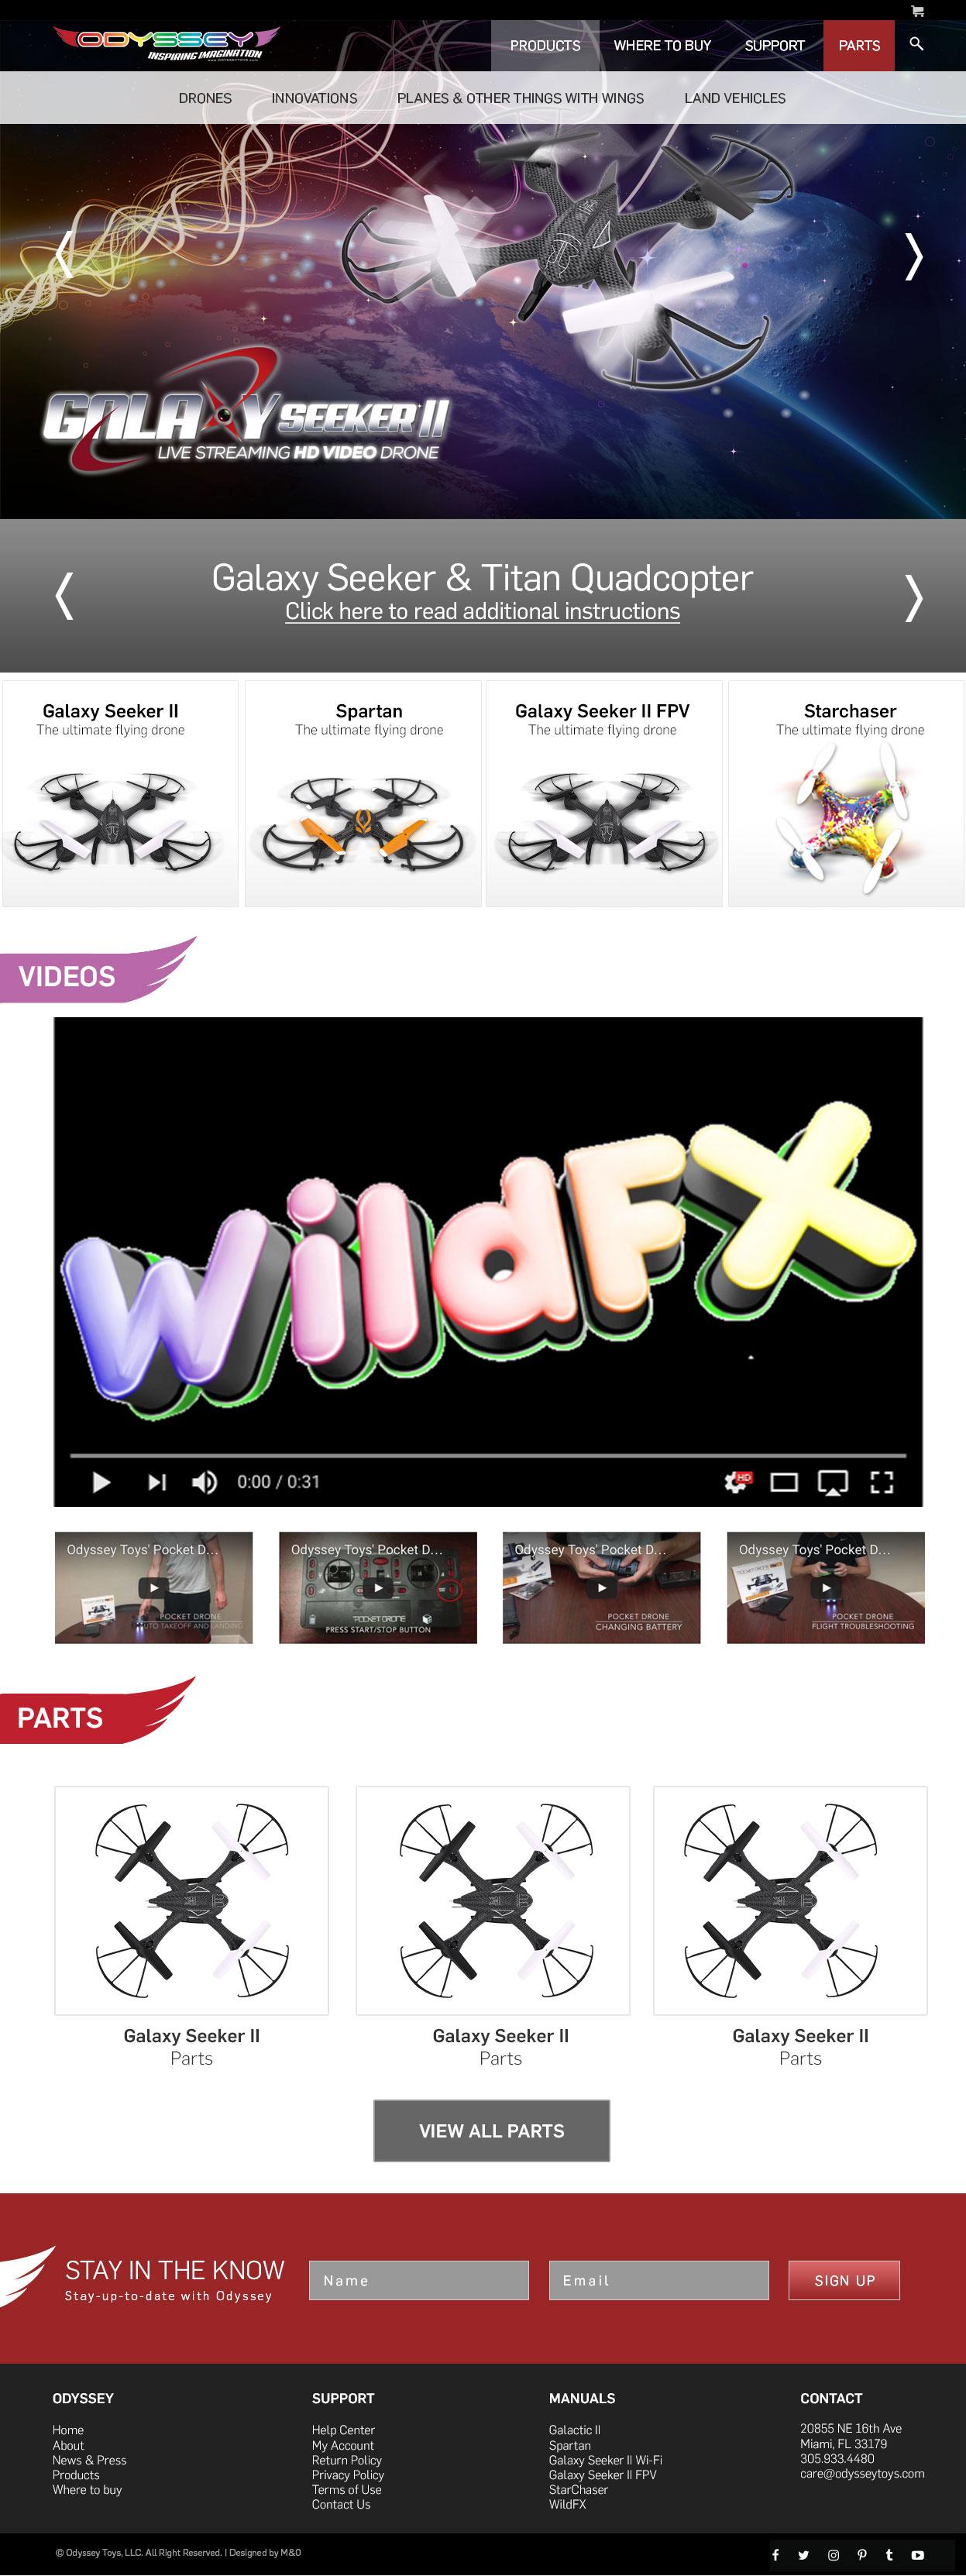 Odyssey Toys Web Design by M&O